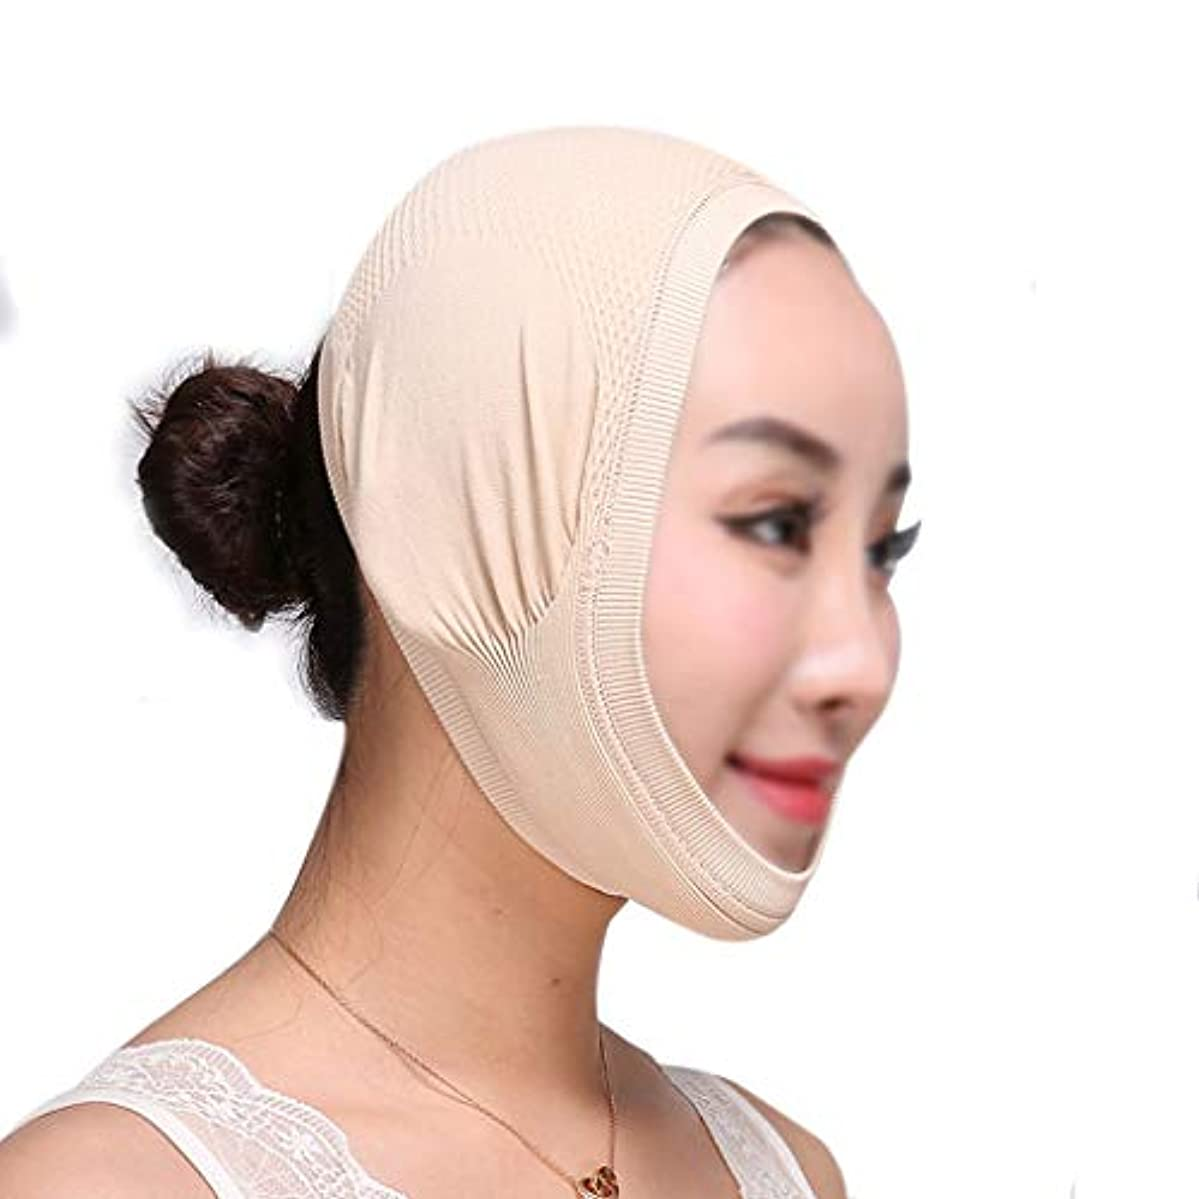 XHLMRMJ 整形外科病院ライン彫刻術後回復ヘッドギア医療マスク睡眠vフェイスリフティング包帯薄いフェイスマスク (Size : Skin tone(B))